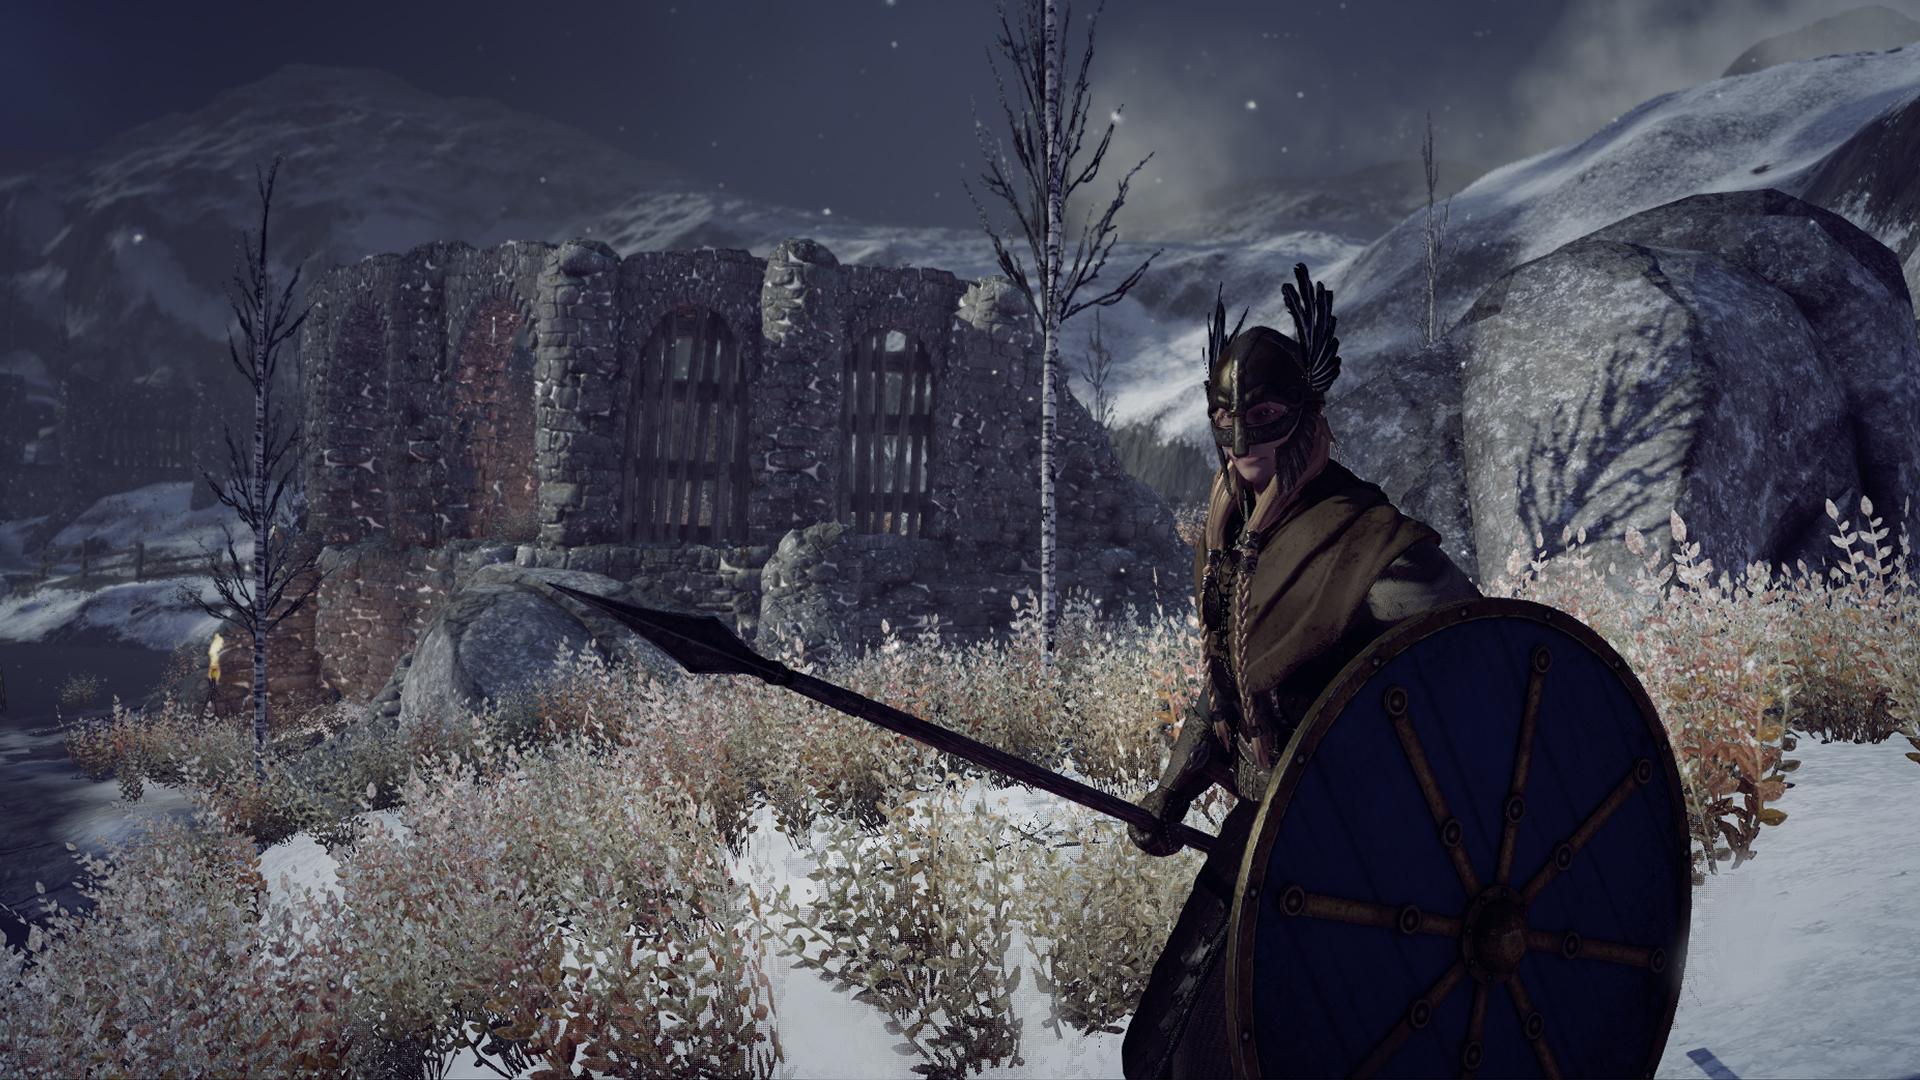 War_of_the_Vikings_Screenshot_04.jpg